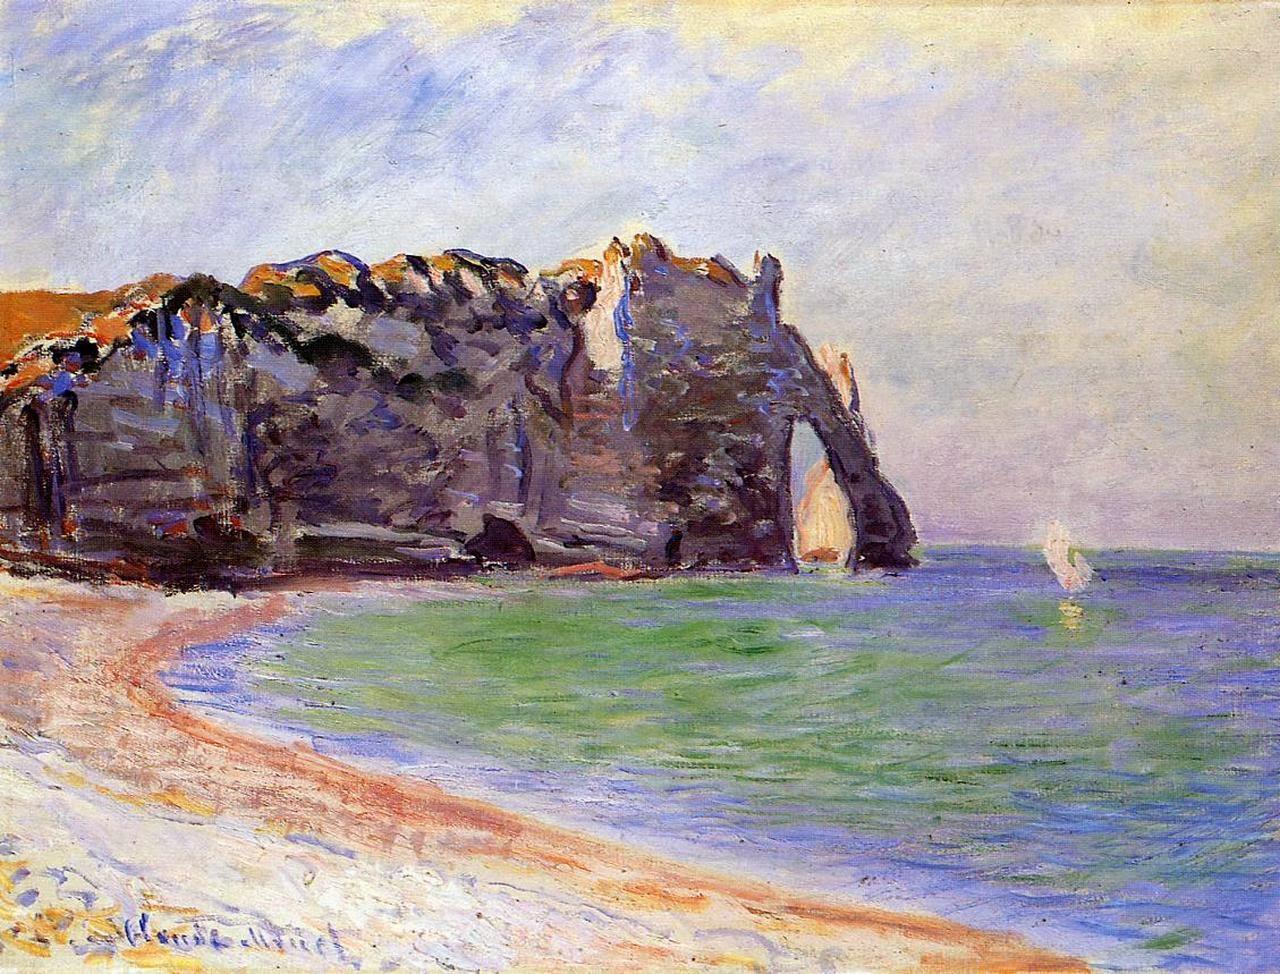 ����� � ���� < ������, ���� �'����� >:: ���� ����, �������� ������� - ���� ���� (Claude Monet) ����